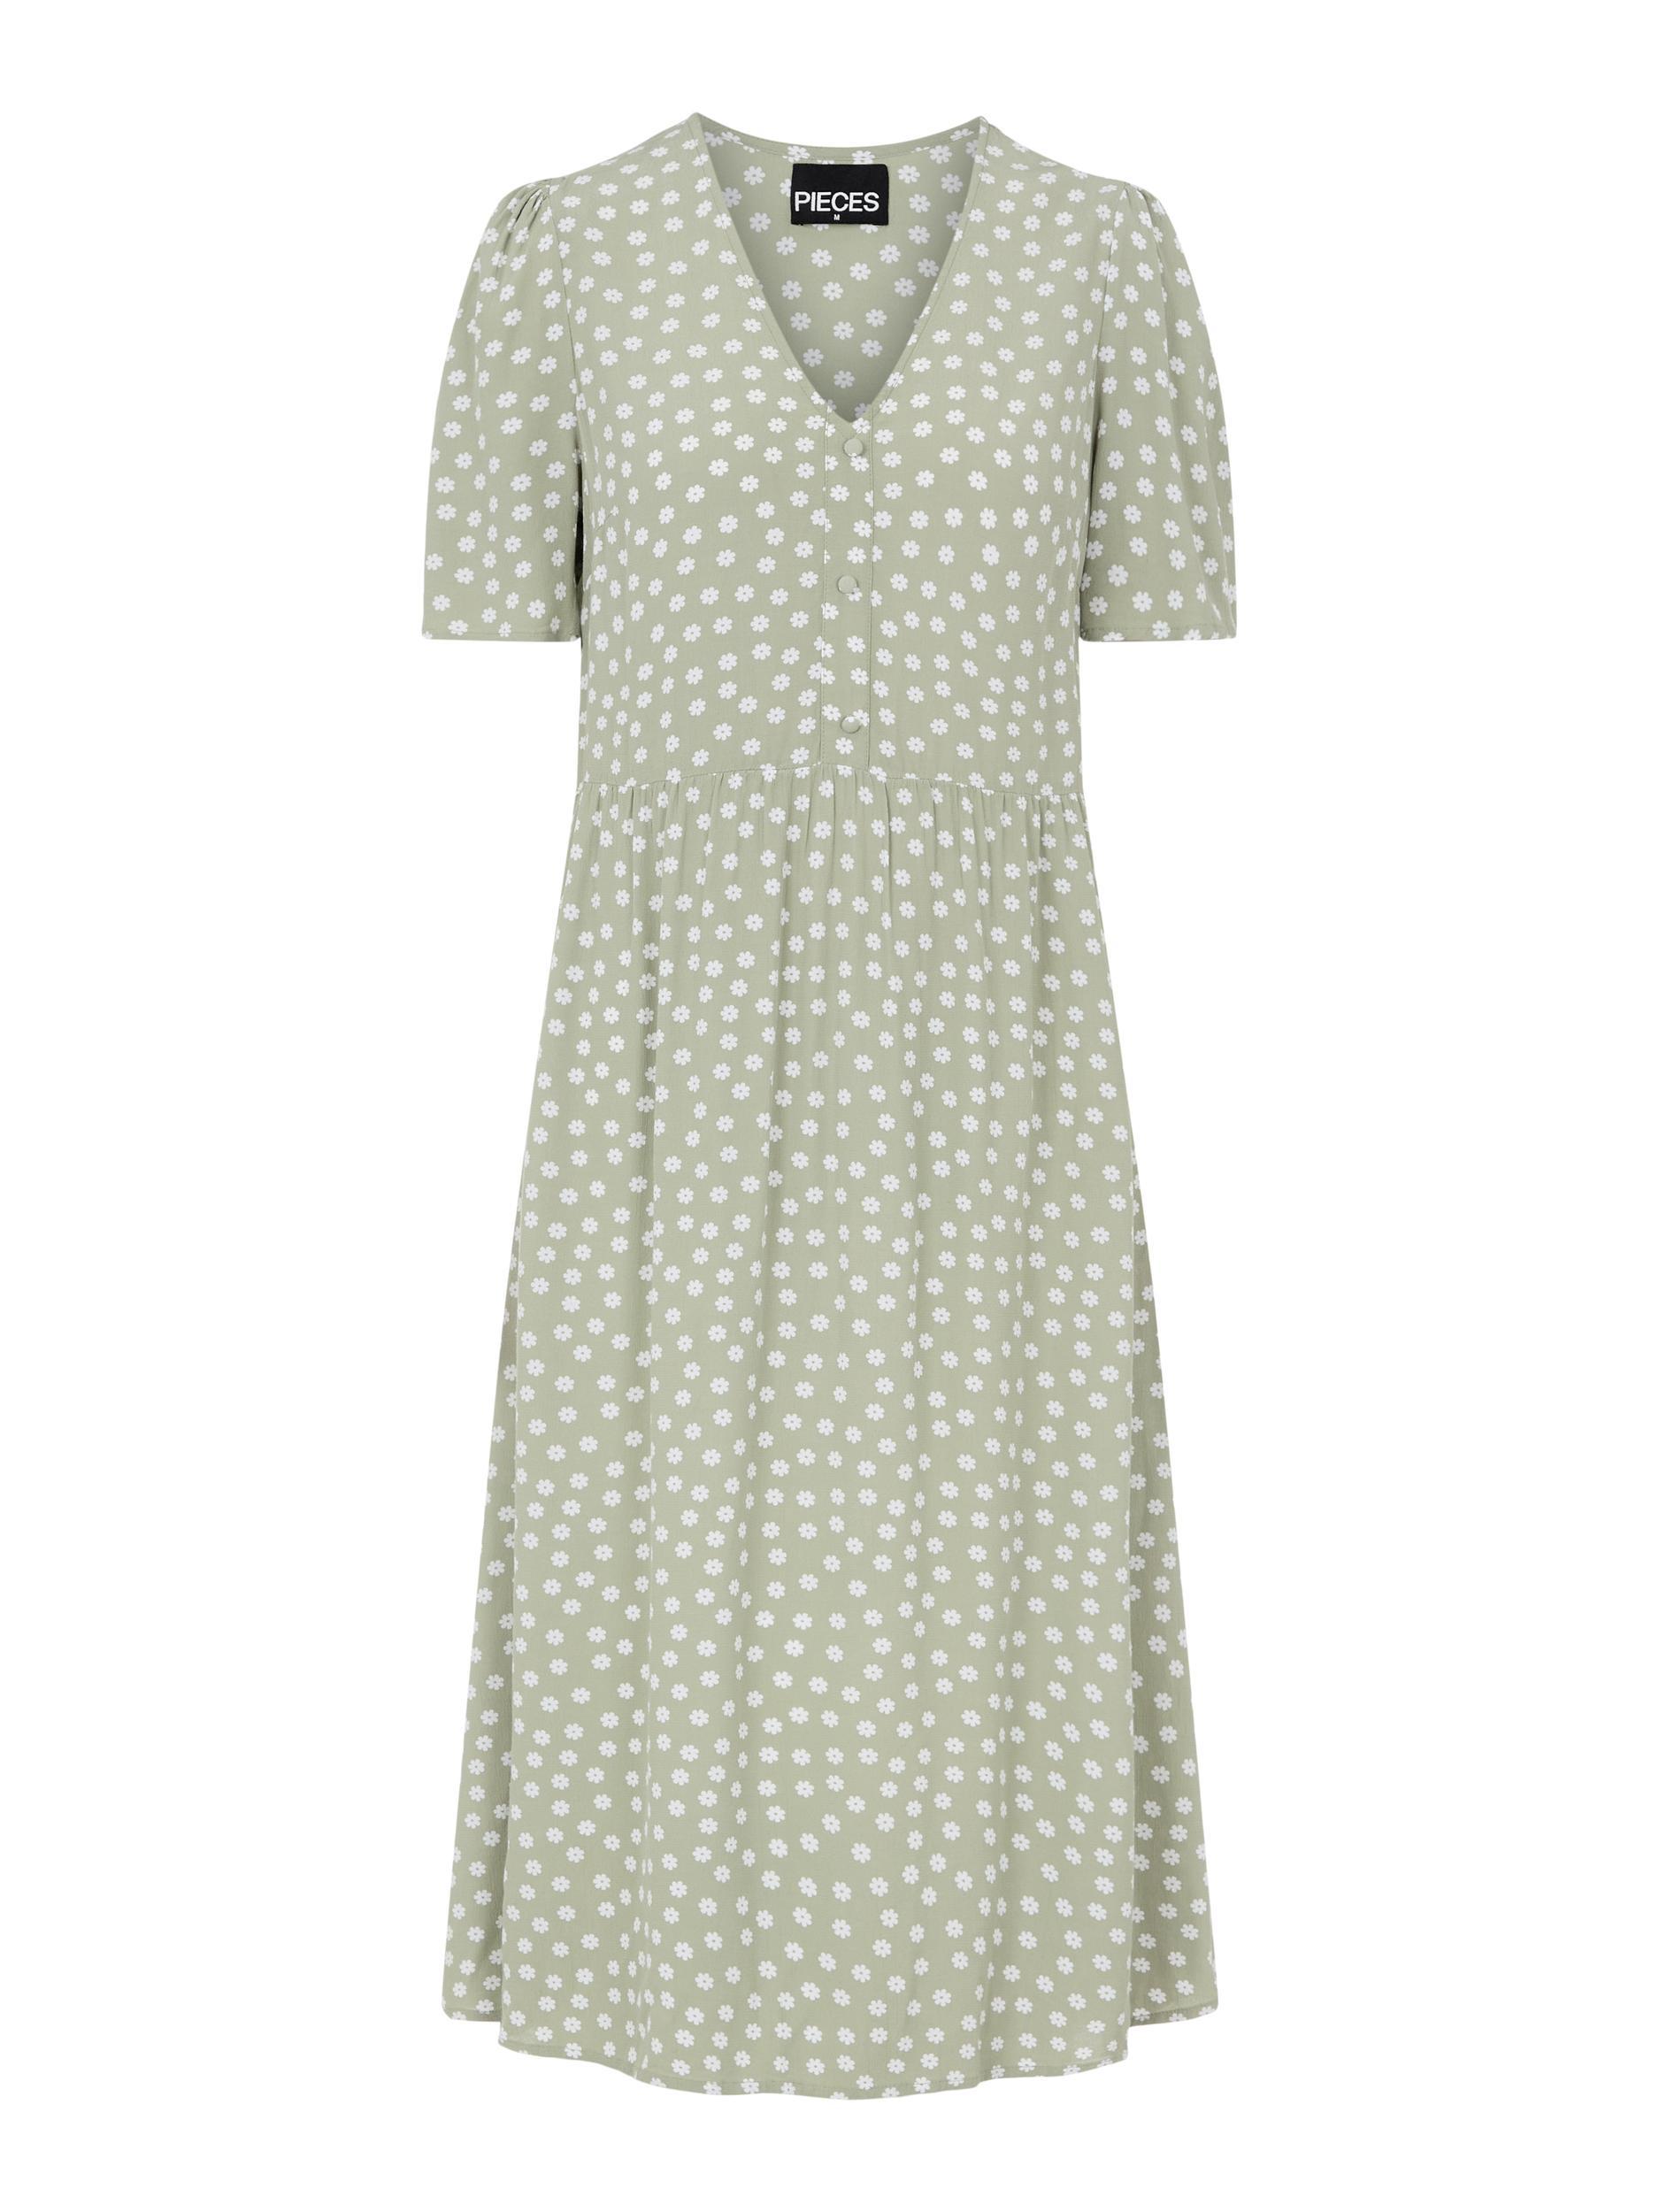 Pieces Selma kjole, desert sage, small